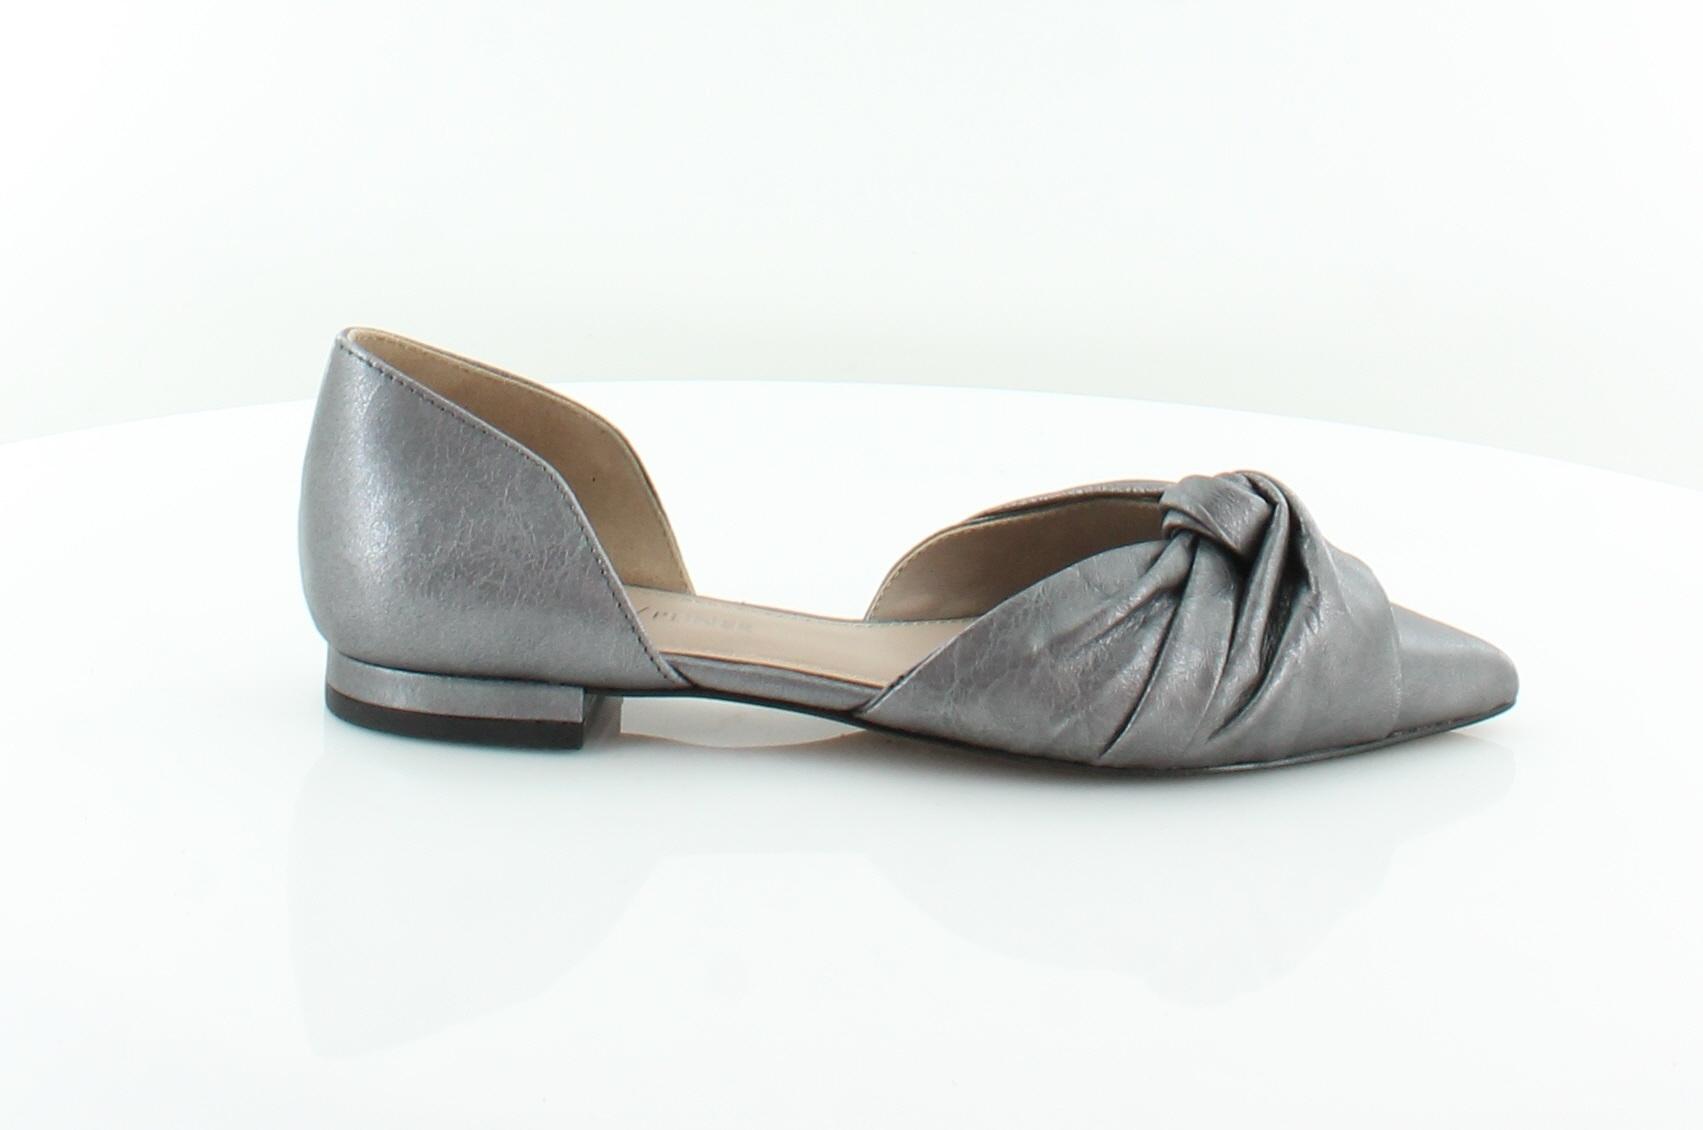 db6864be0b6 Donald J Pliner Pennie Silver Womens Shoes Size 7 M Flats MSRP  228 ...